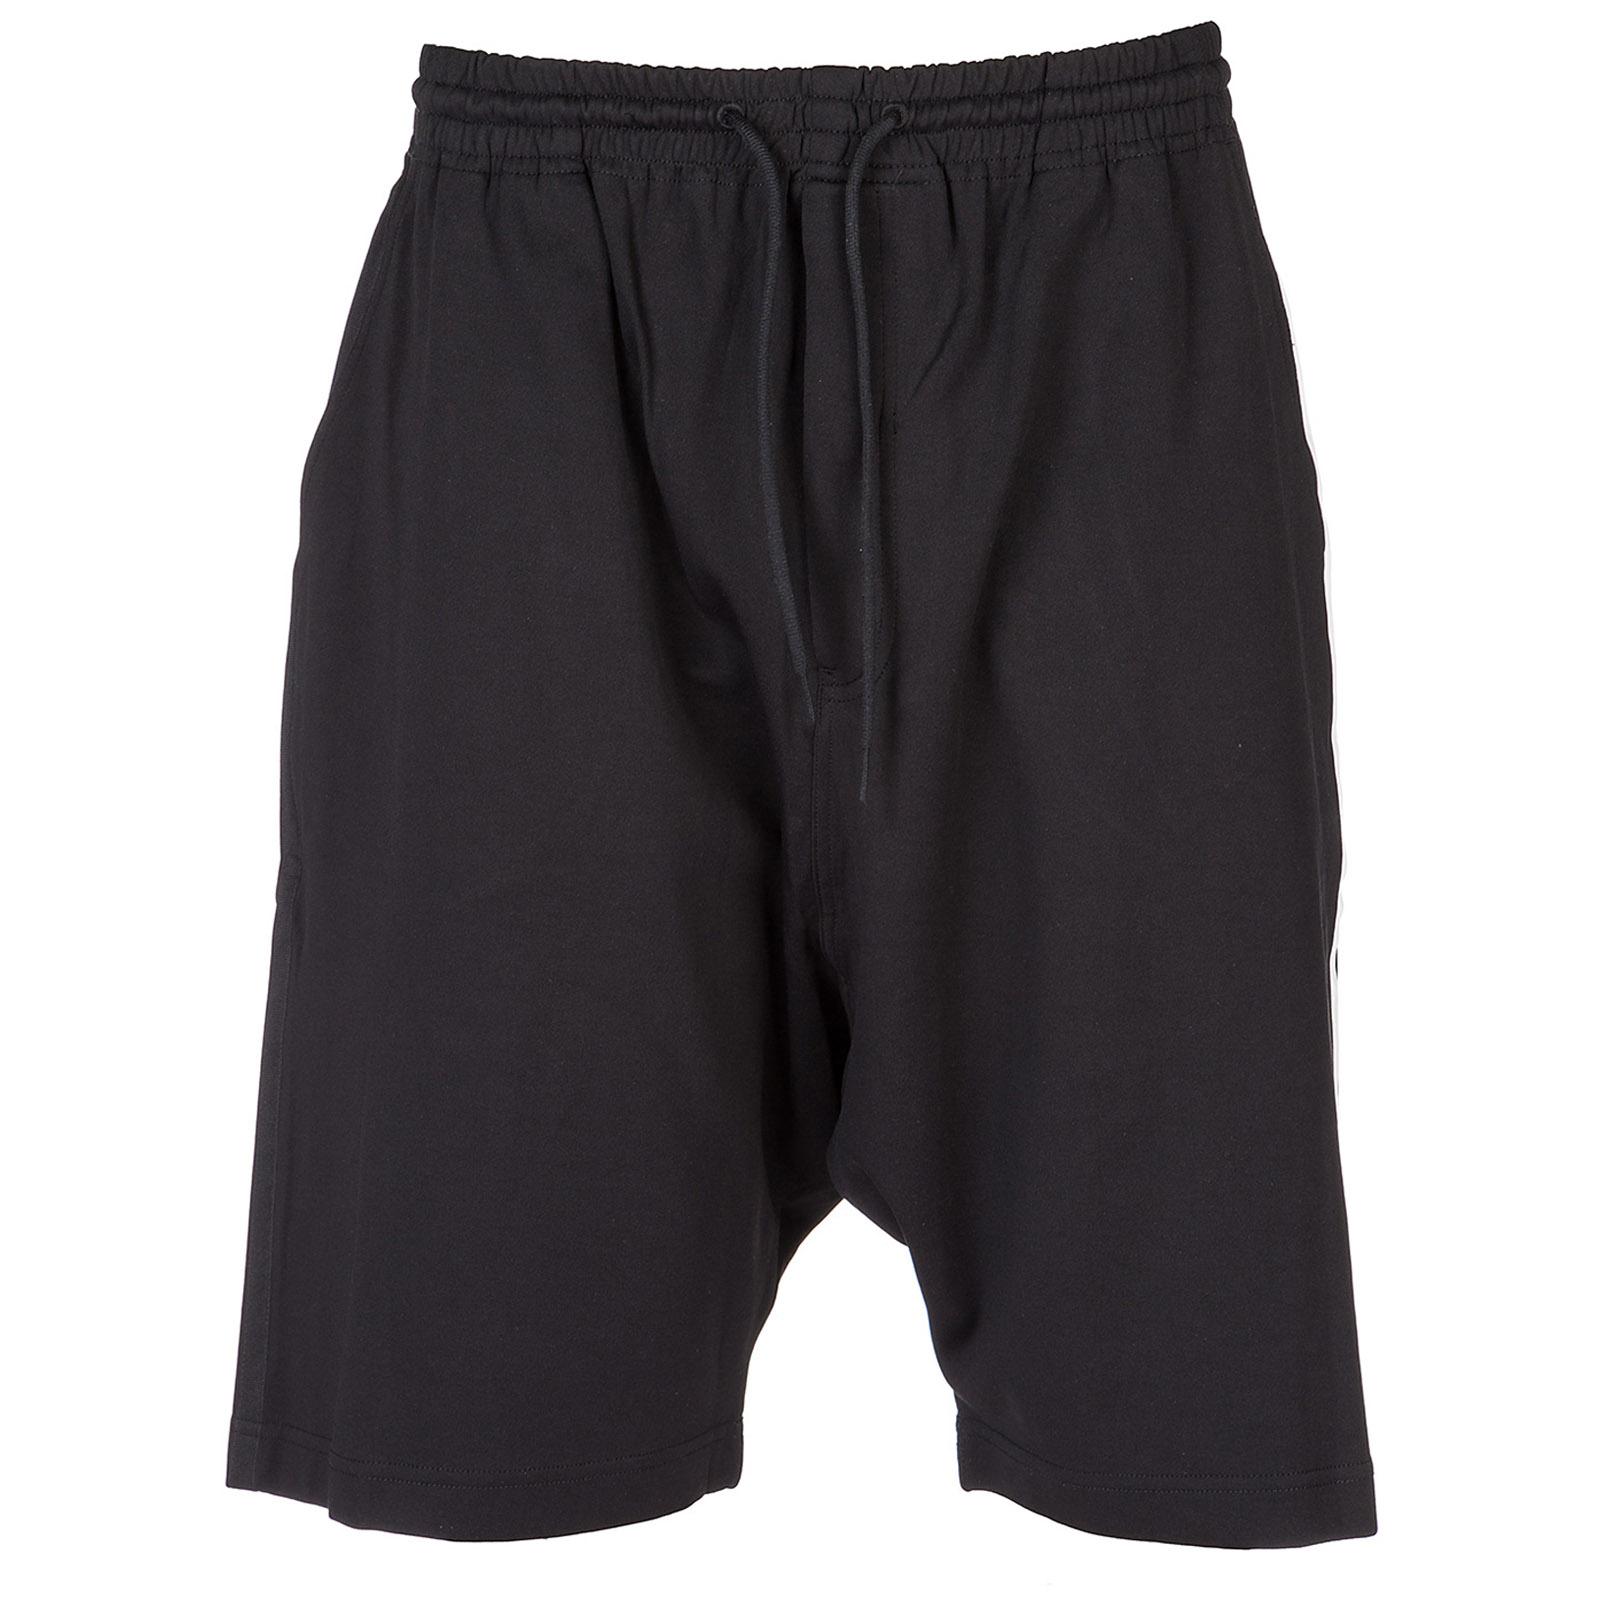 Bermuda shorts pantaloncini uomo 3-stripes